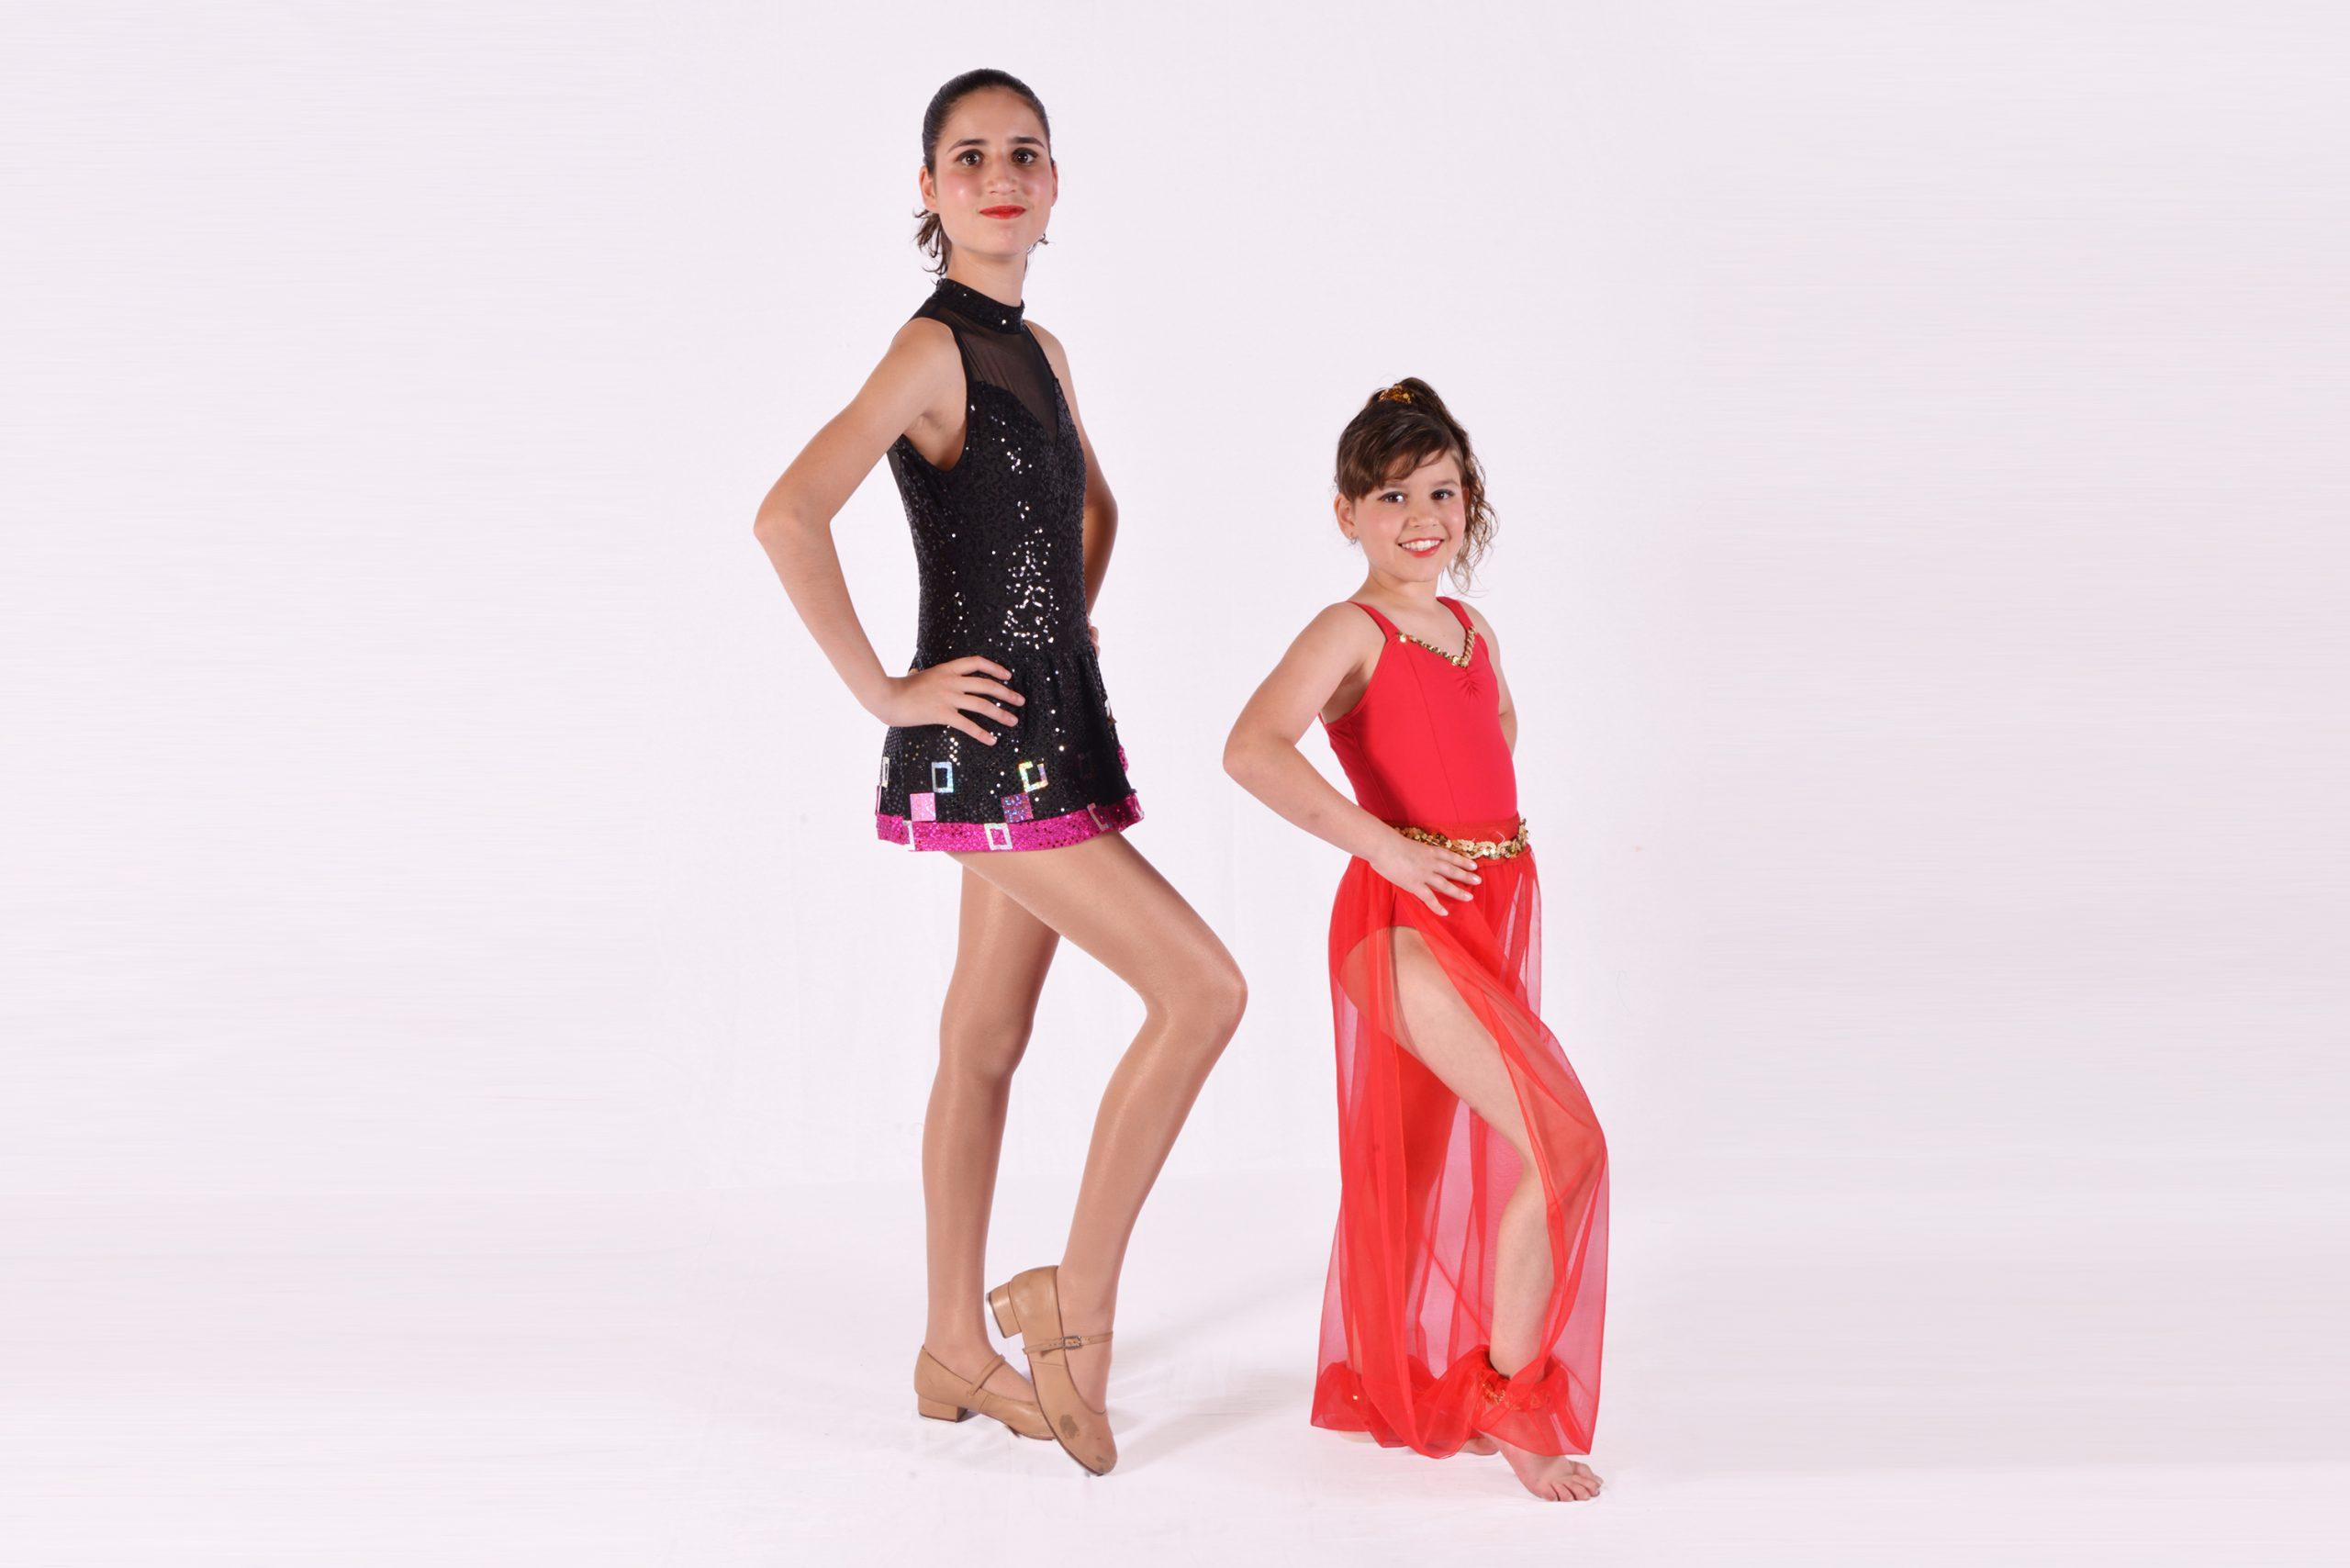 Diakosmos_Dance_Academy_Core_value_all_embracing